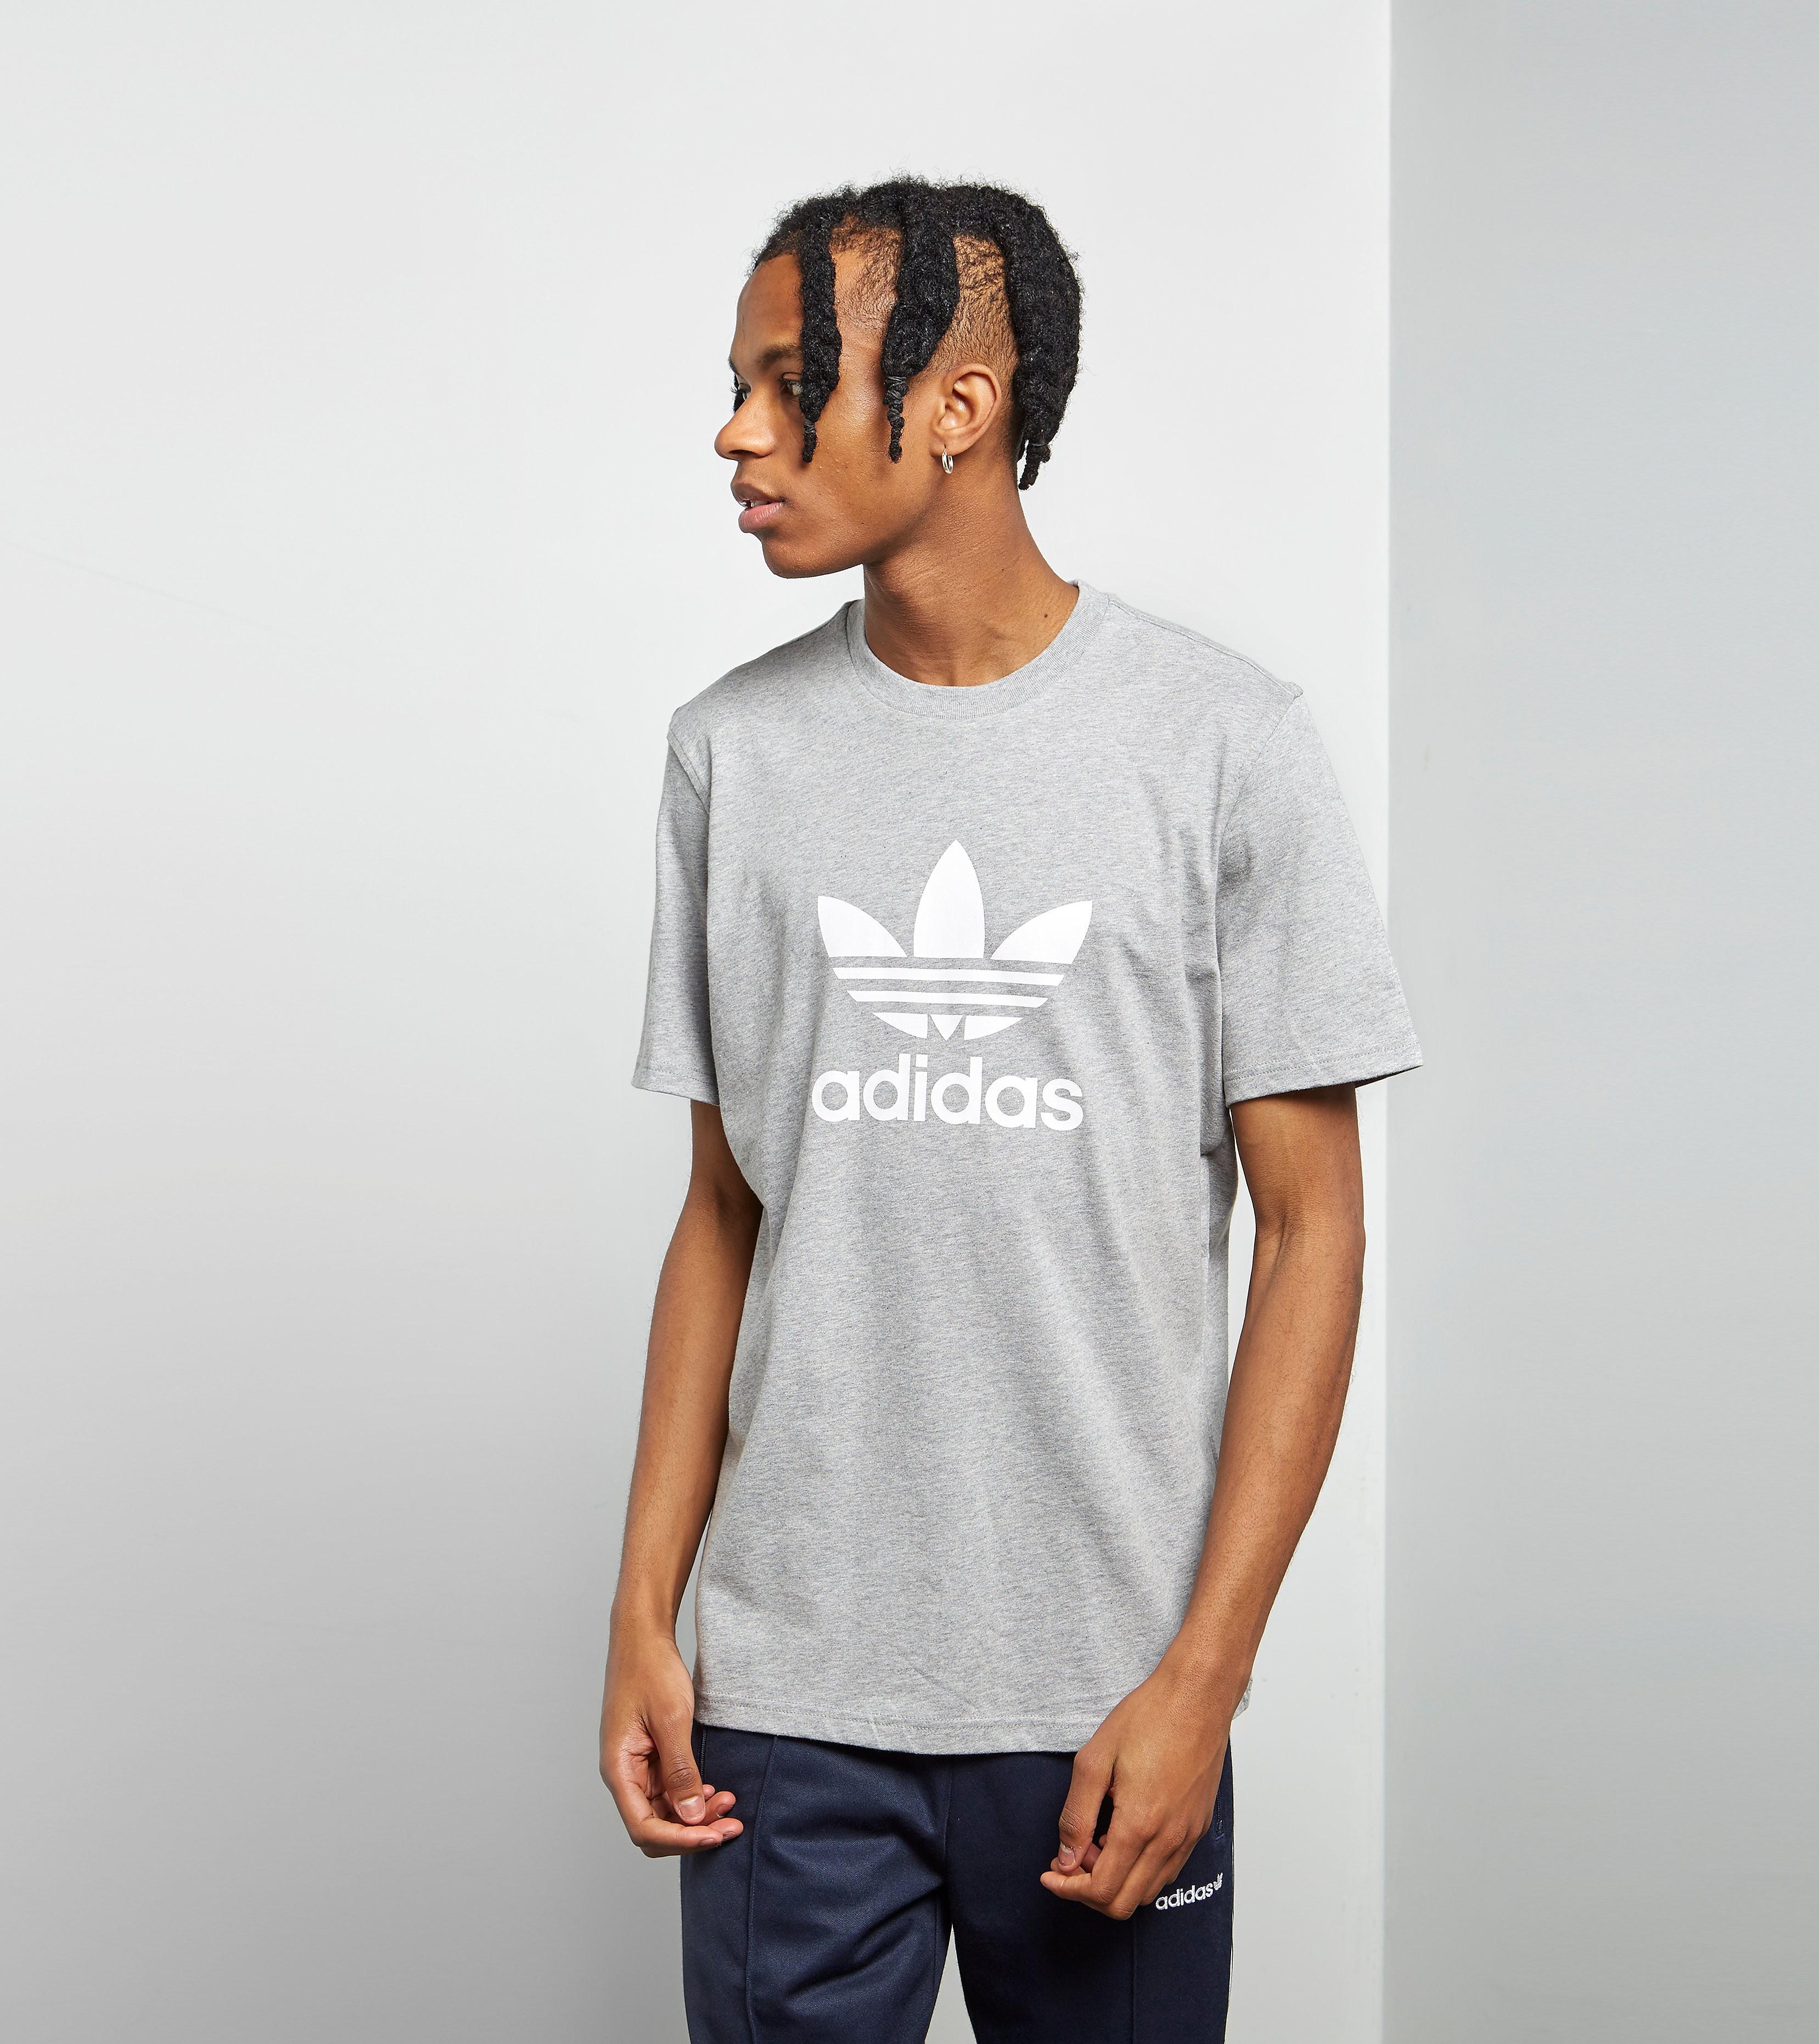 adidas Originals T-Shirt Trefoil State